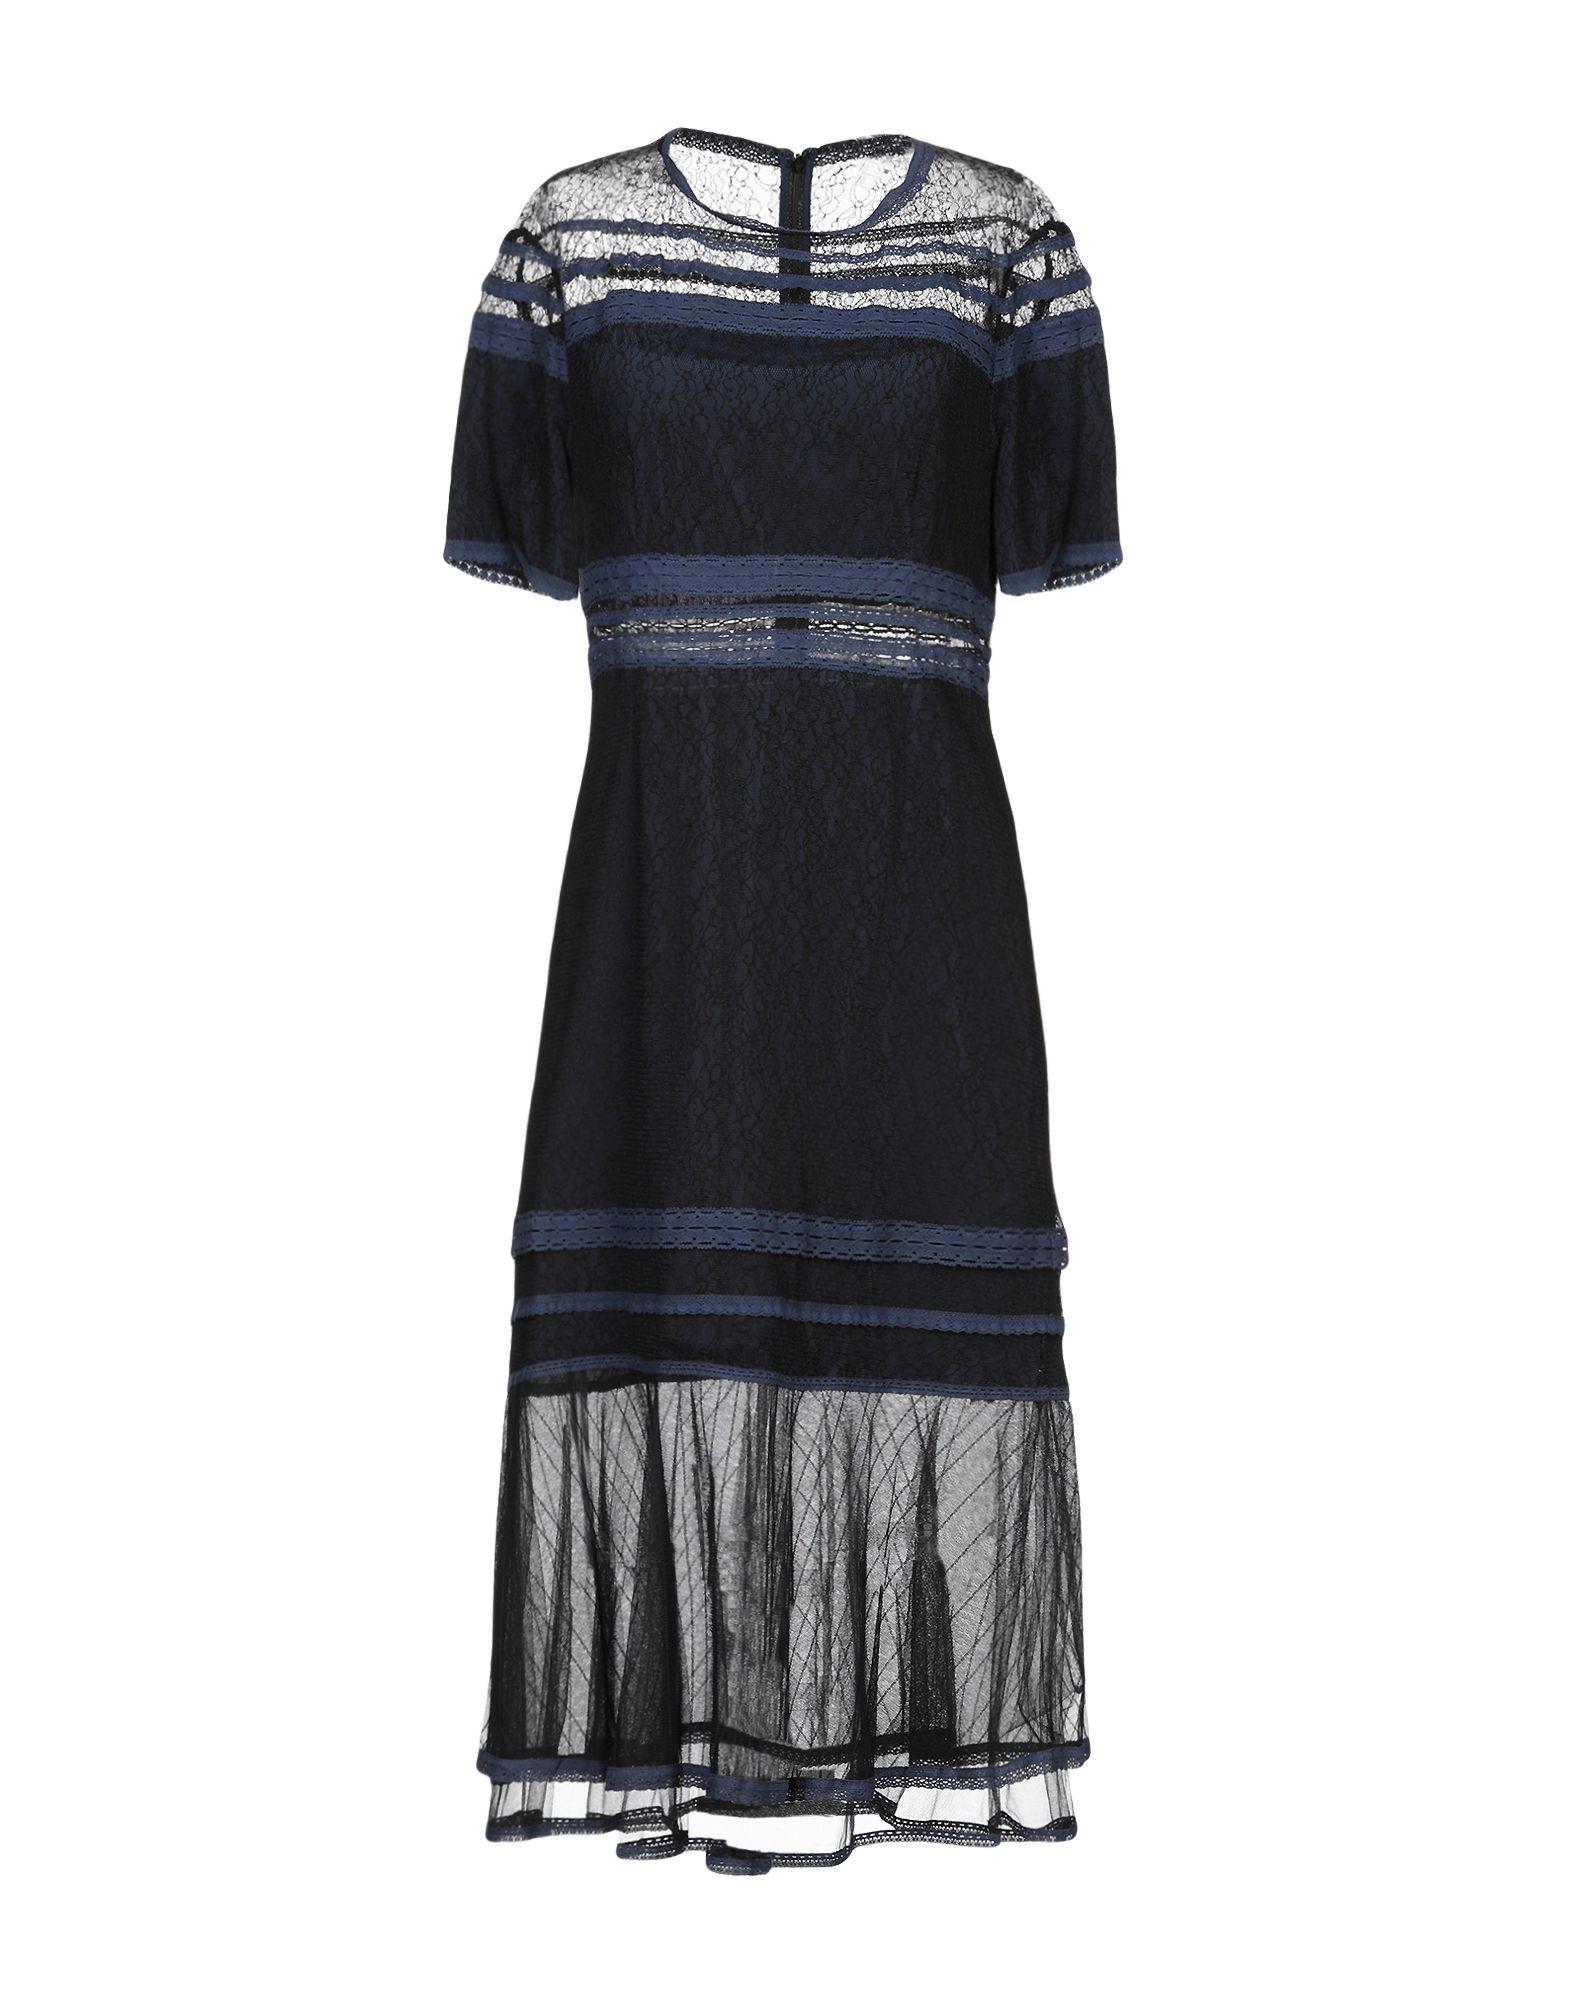 JONATHAN SIMKHAI Платье длиной 3/4